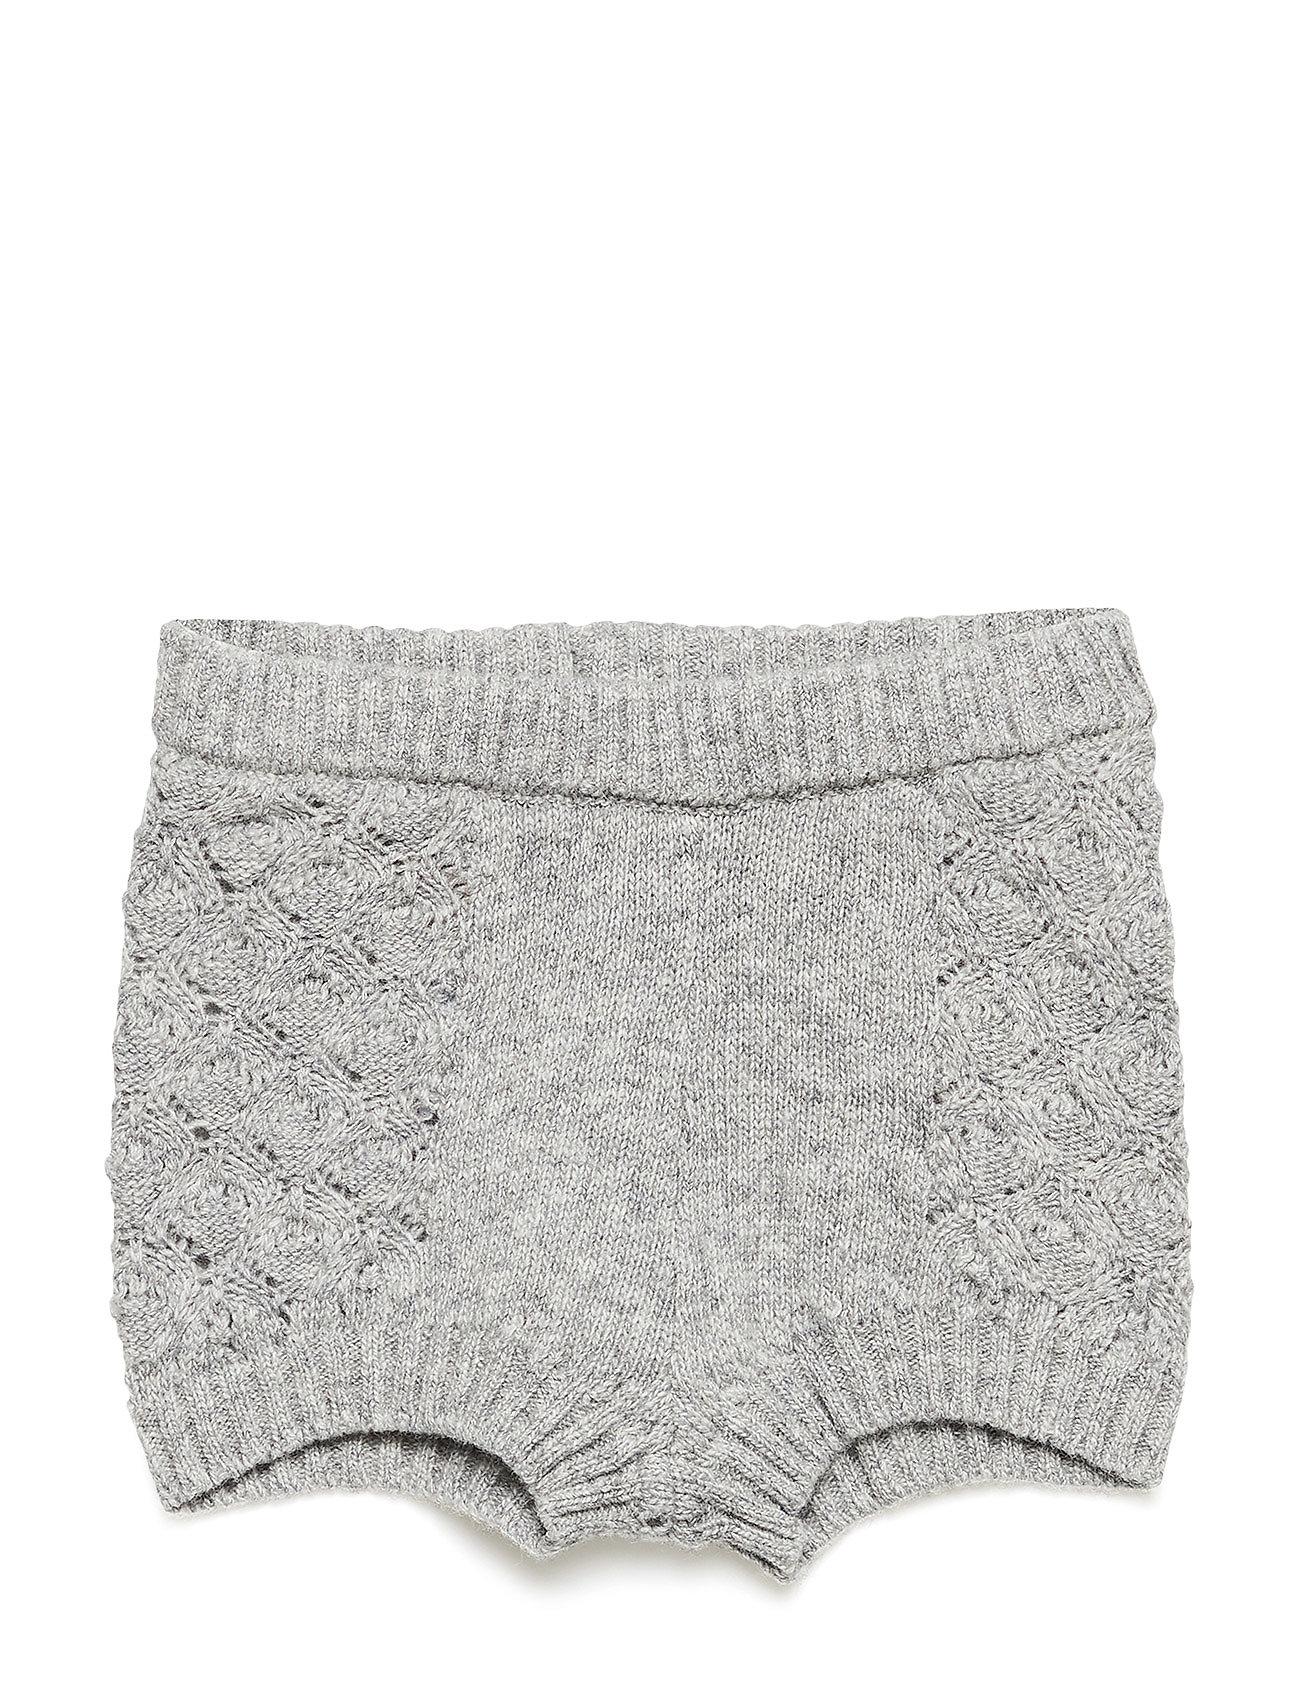 Shorts - Noa Noa Miniature